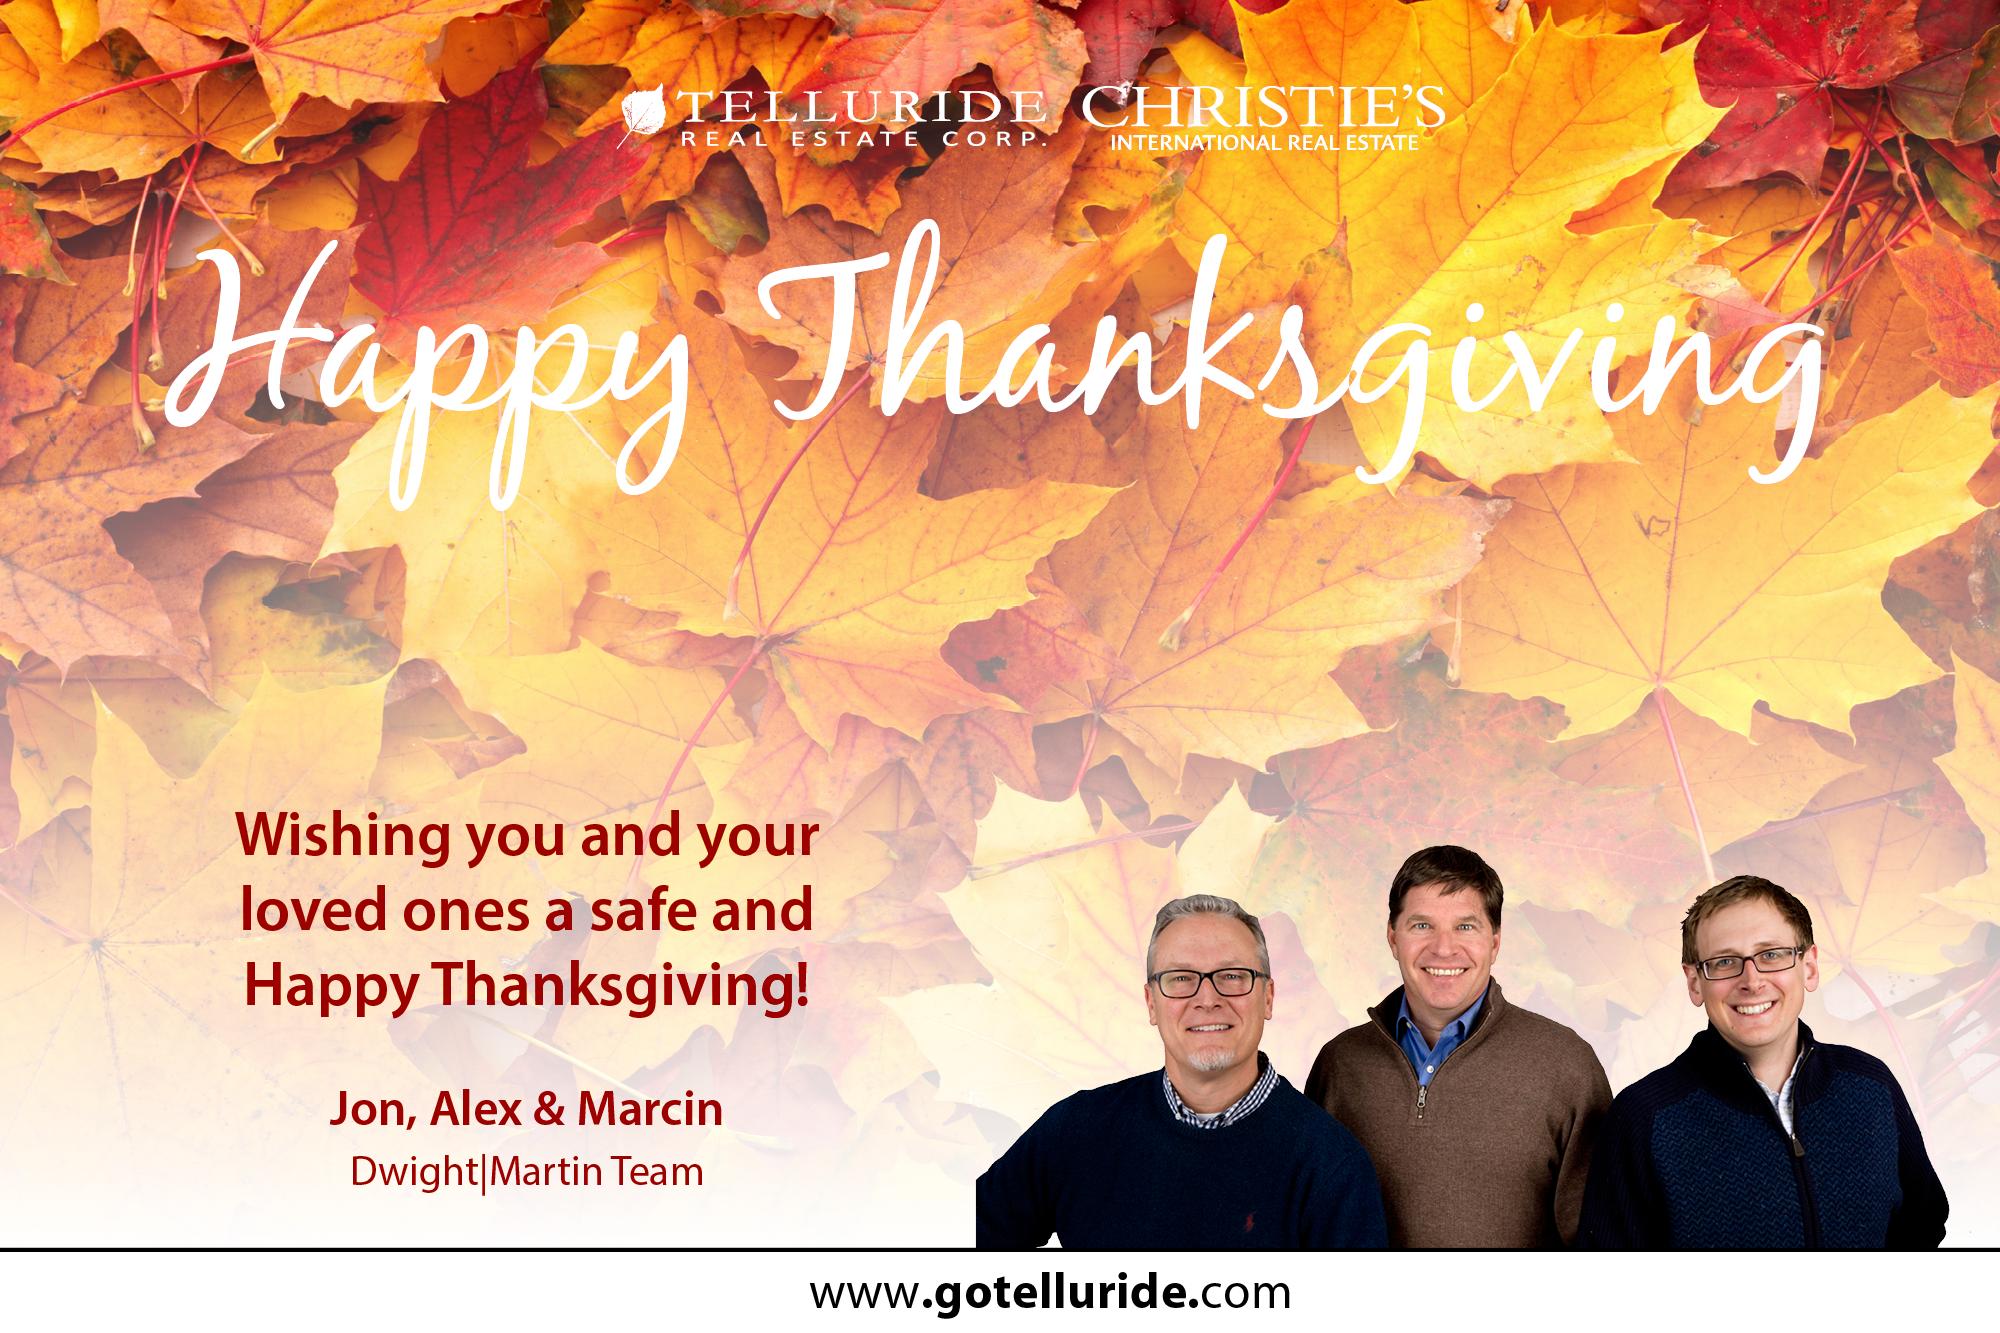 Telluride Real Estate Corp.-Dwight | Martin Team Happy Thanksgiving